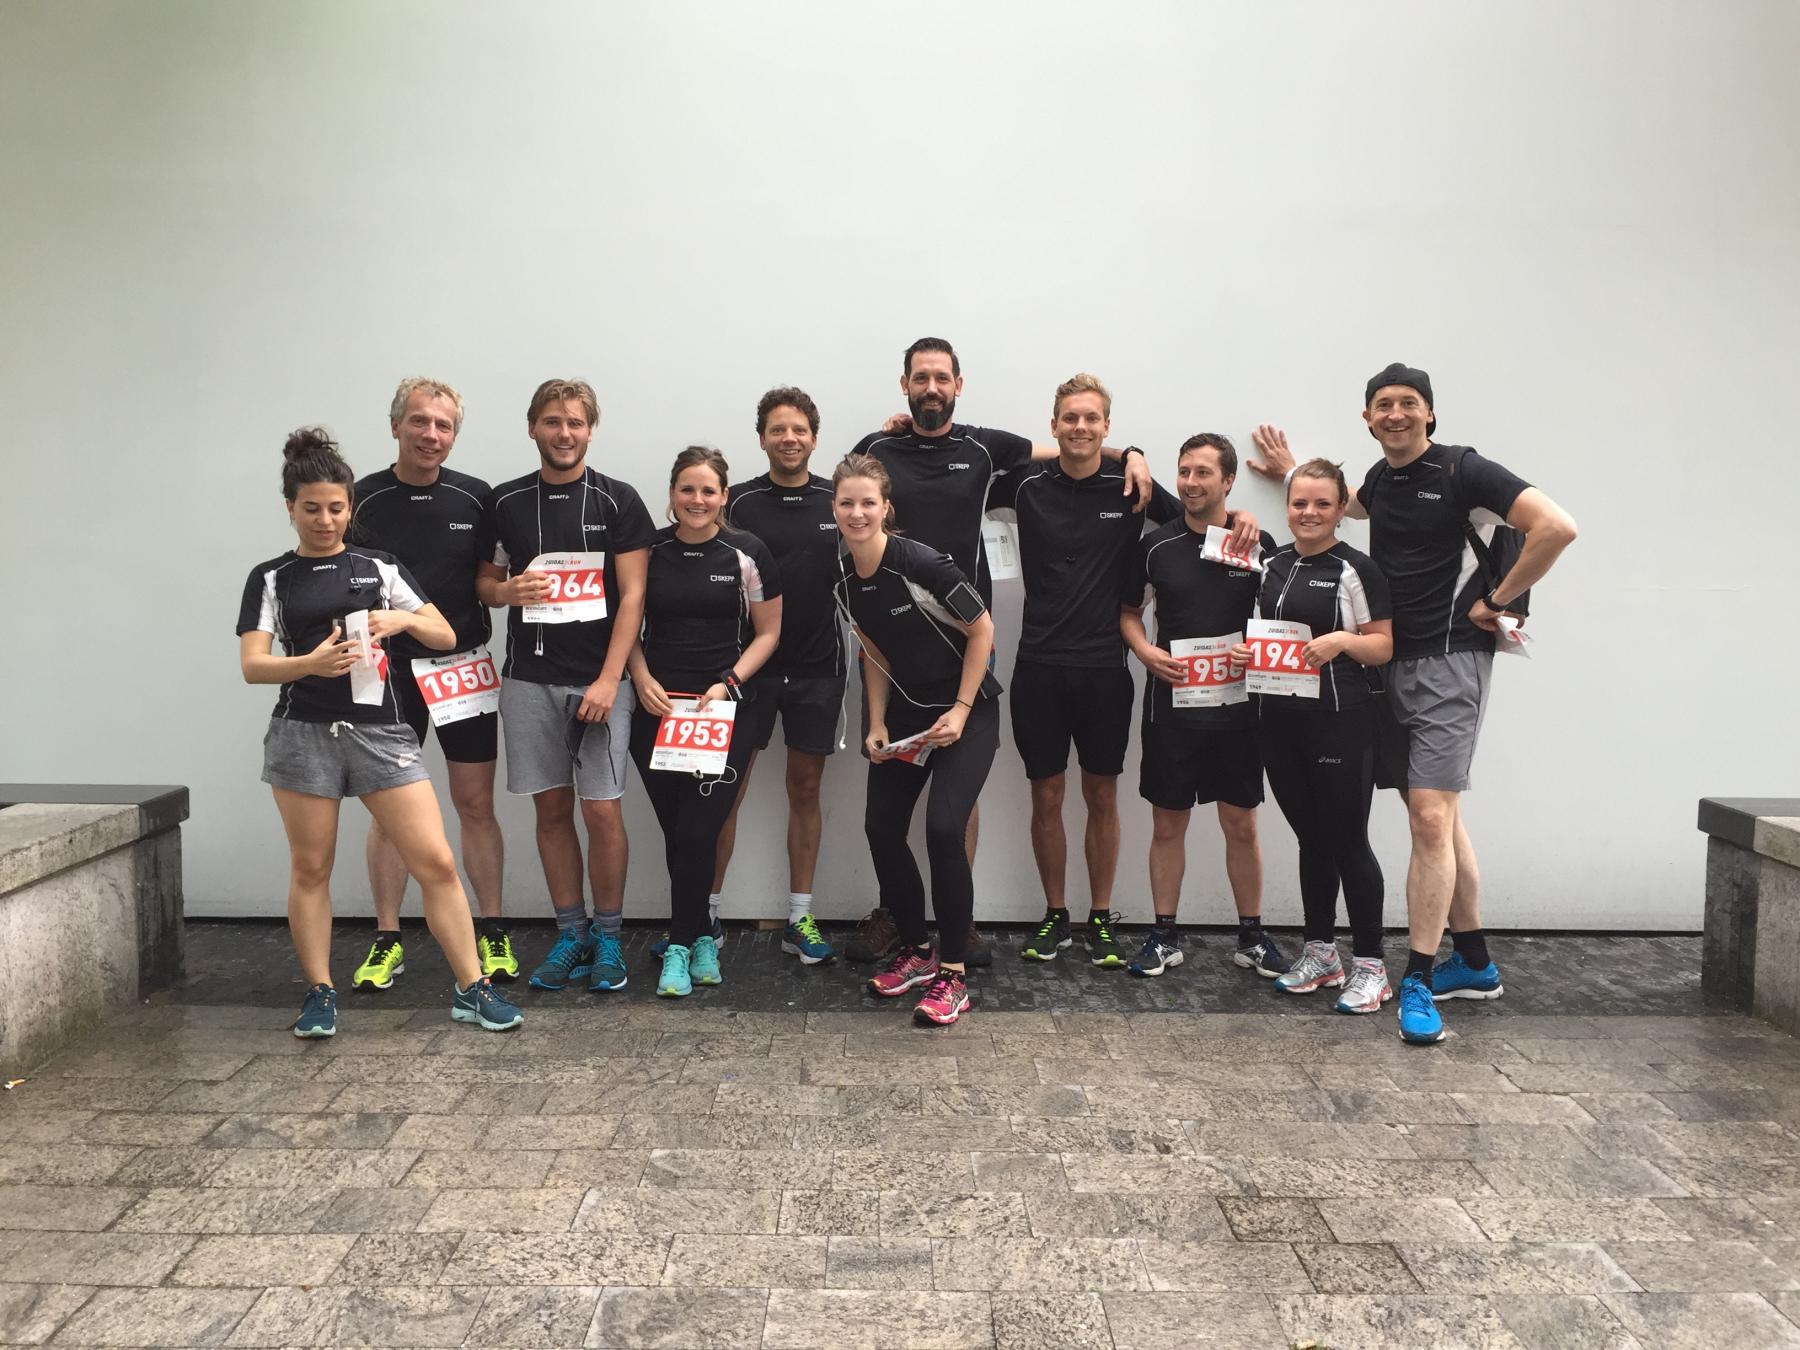 deelnemers SKEPP Zuidas Run 2016 Amsterdam